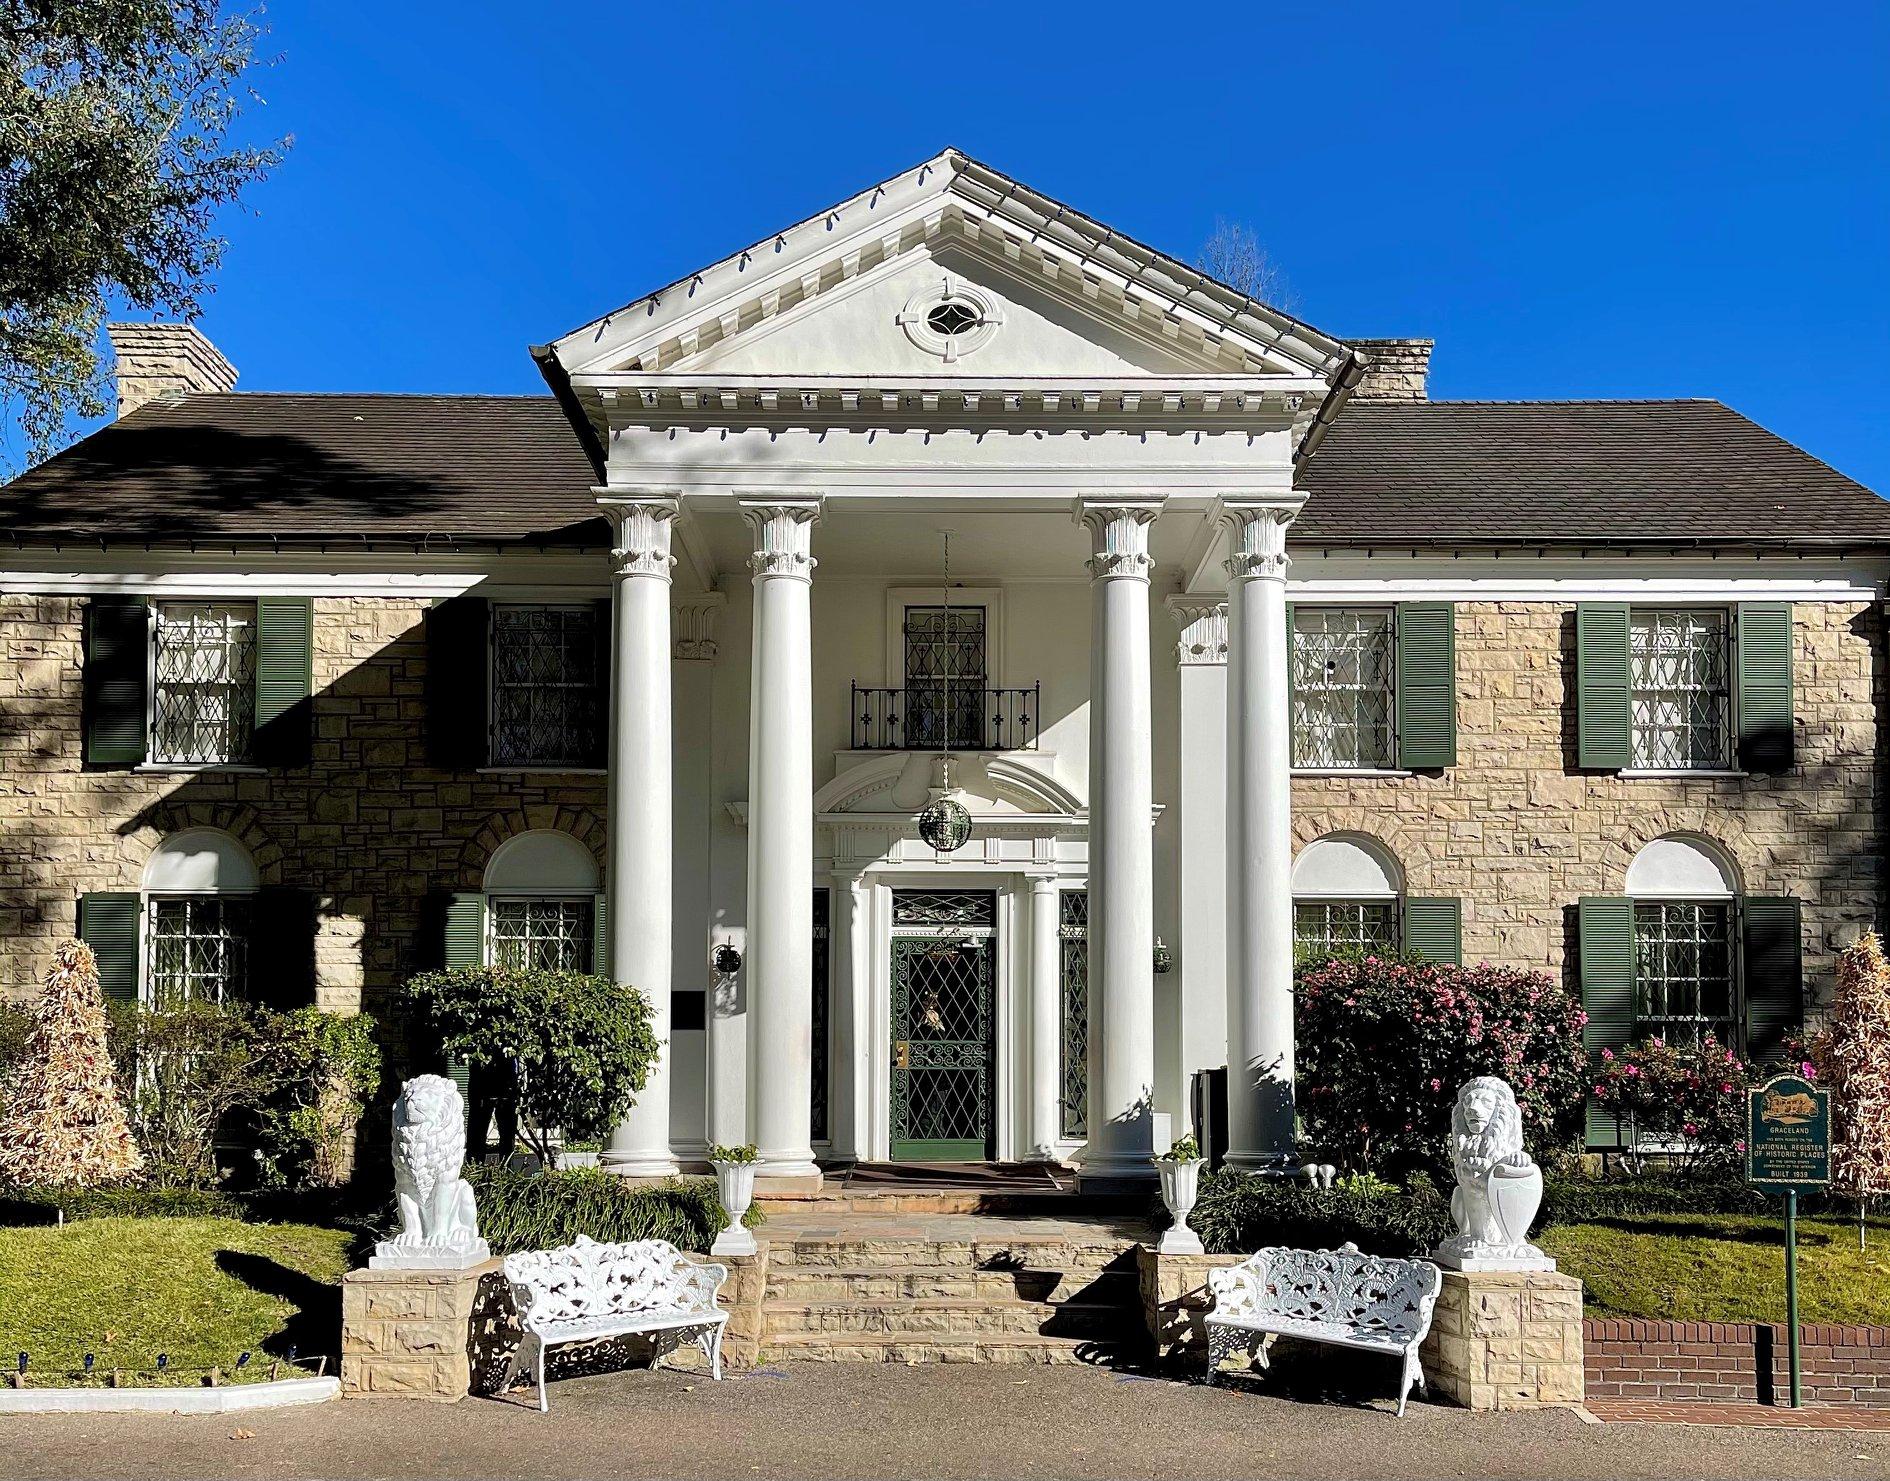 The Mansion at Graceland